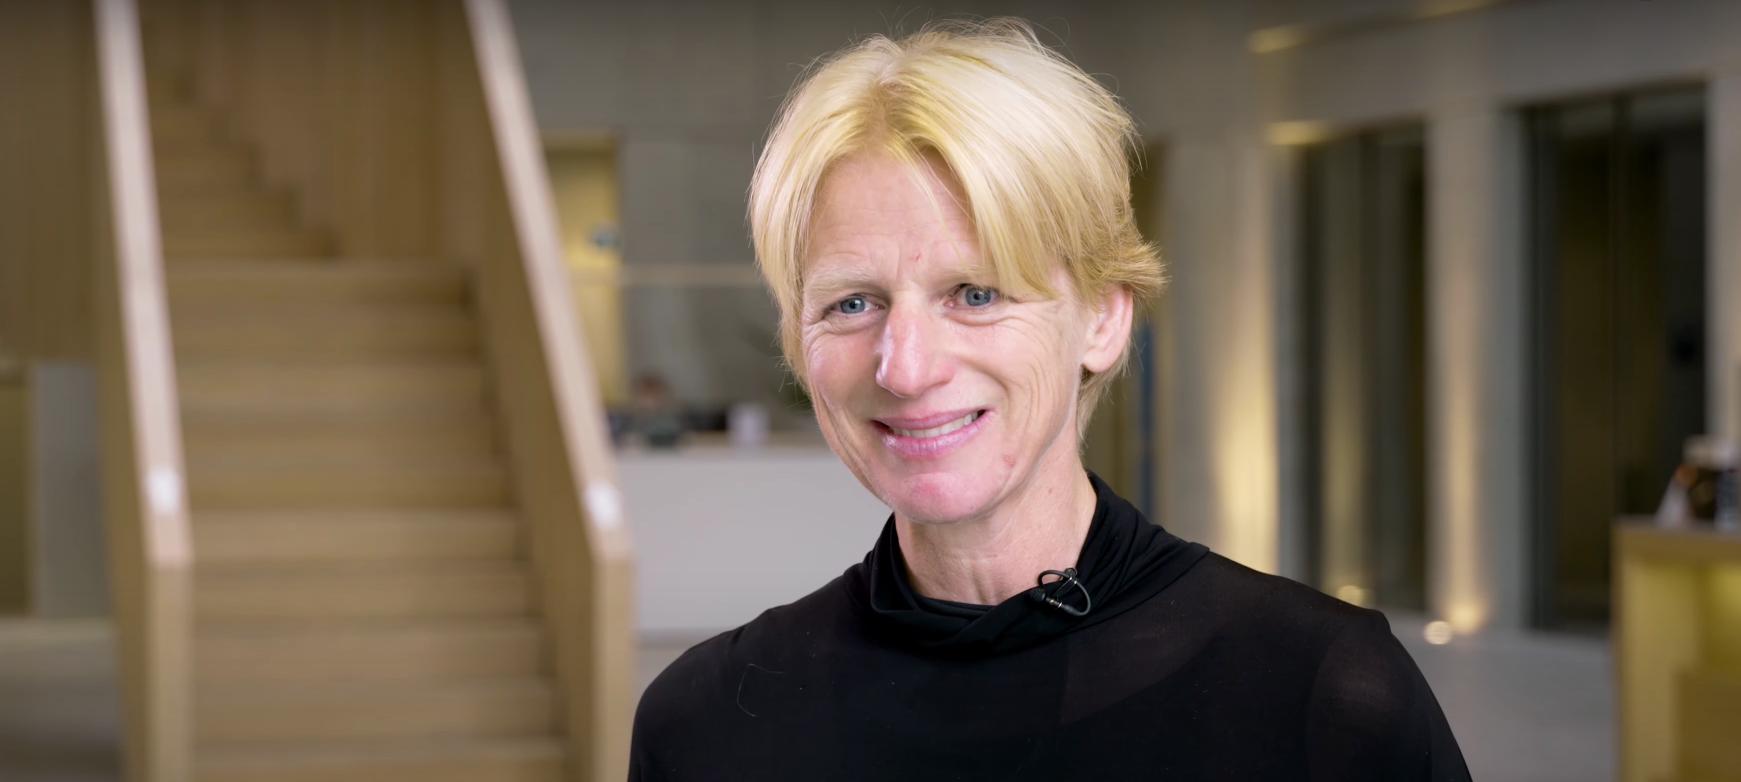 The Art of Scaling team: Anieke Wierenga